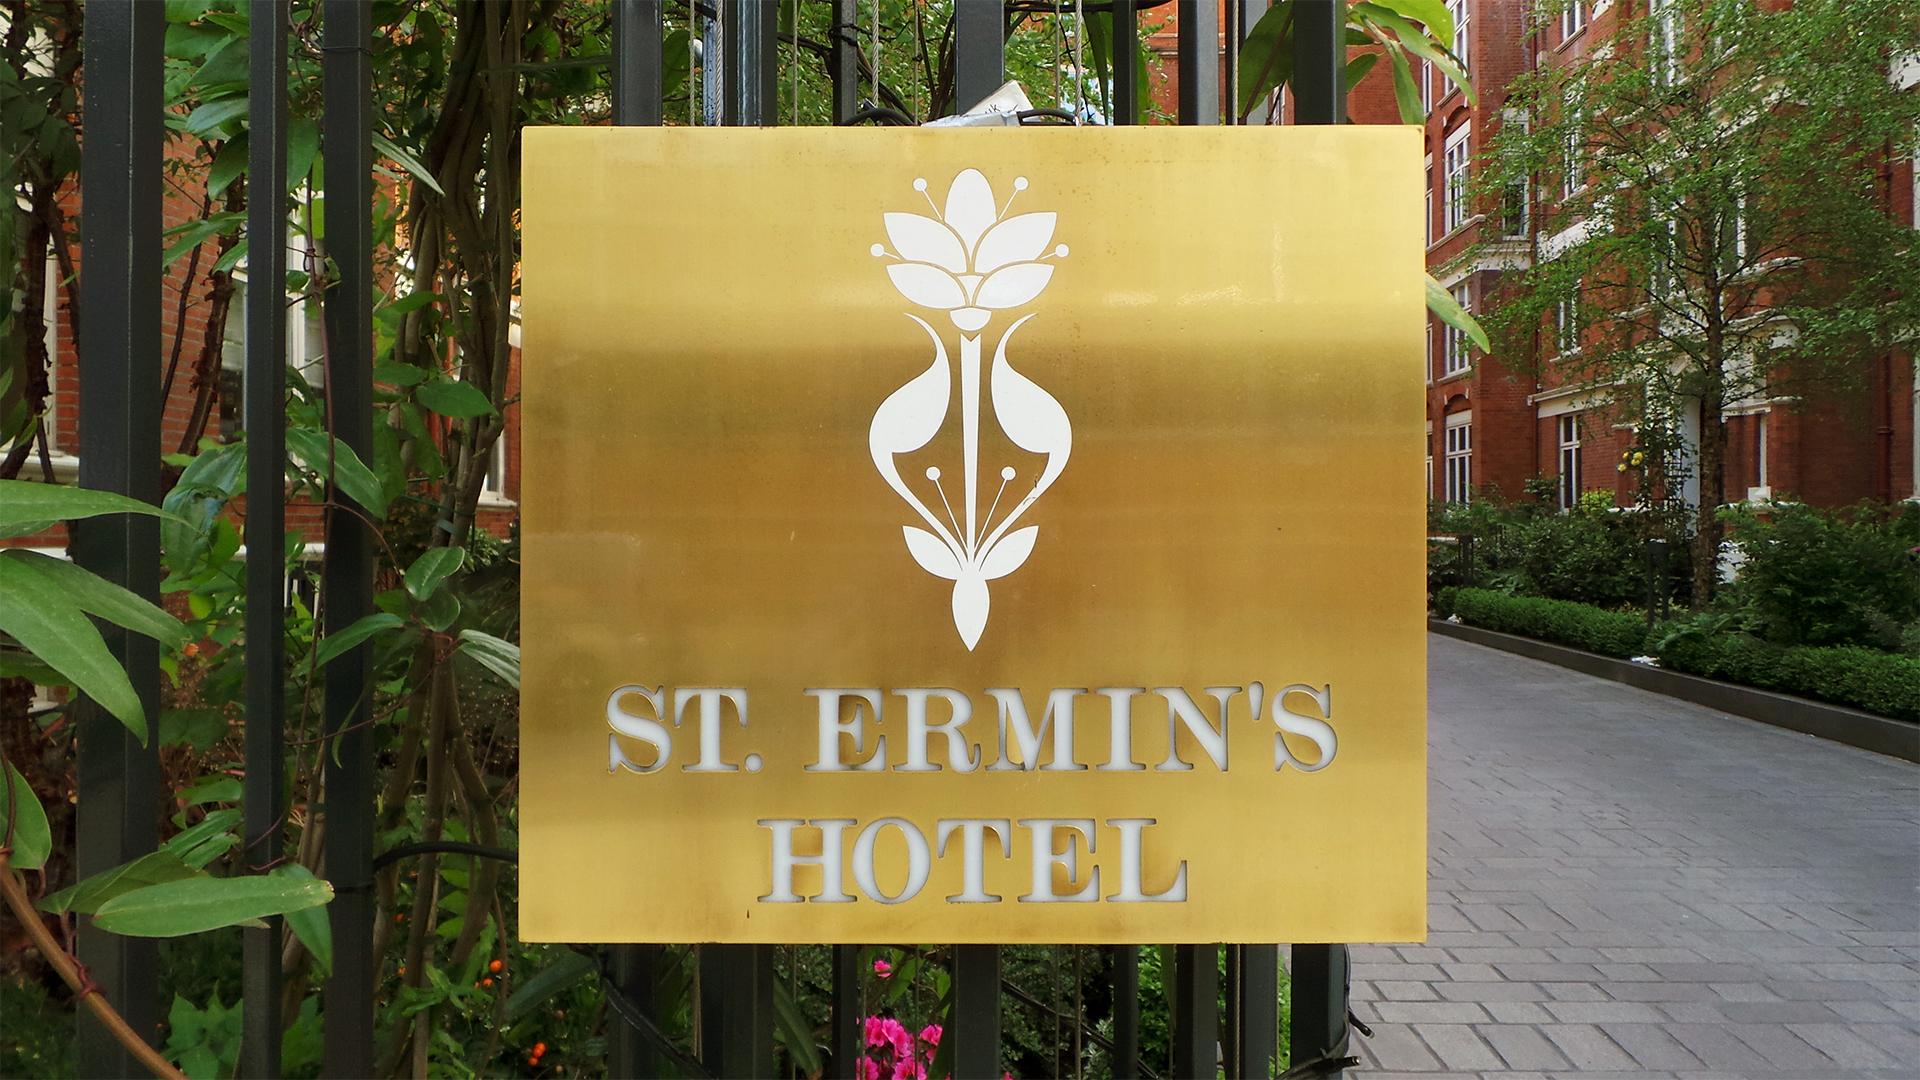 london-signs-illuminated-brass-sign-1